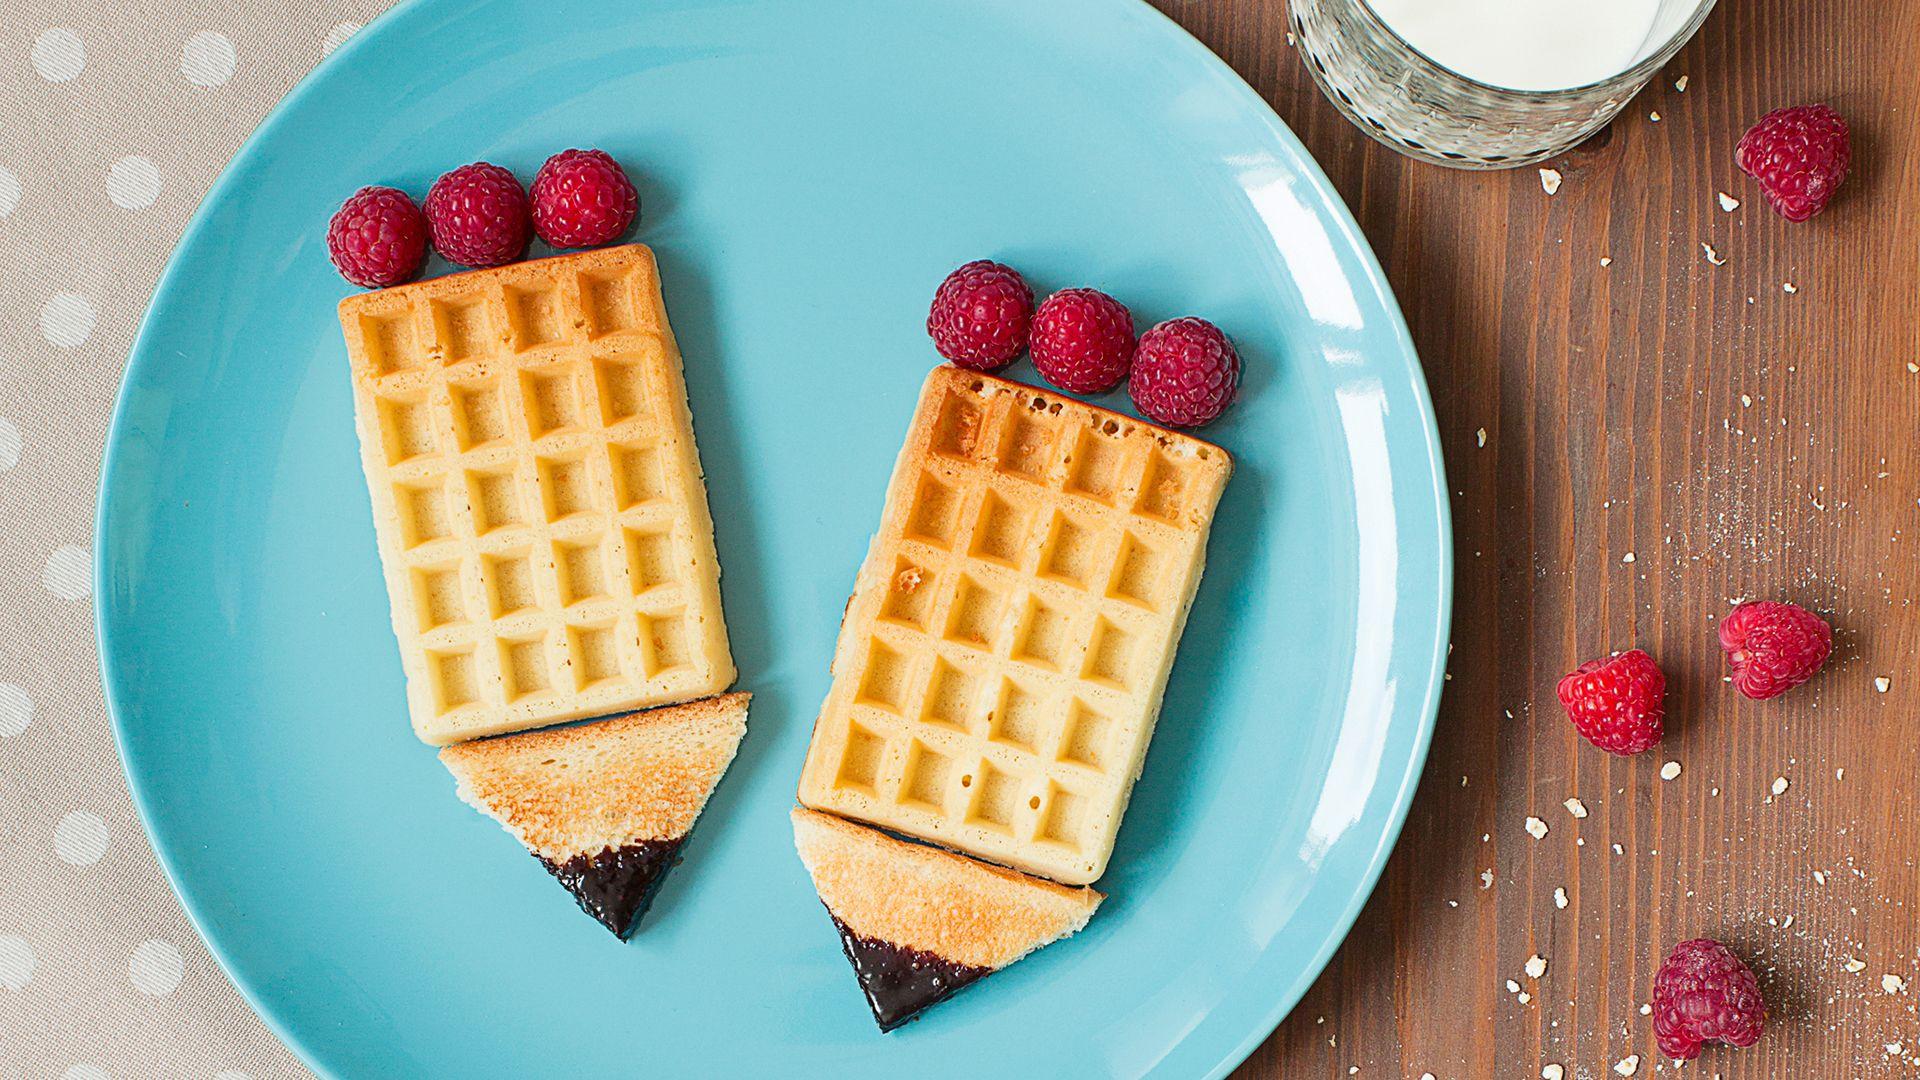 Schul-Snack #waffles #raspberries #chocolate #milk #awesome #sogood ...